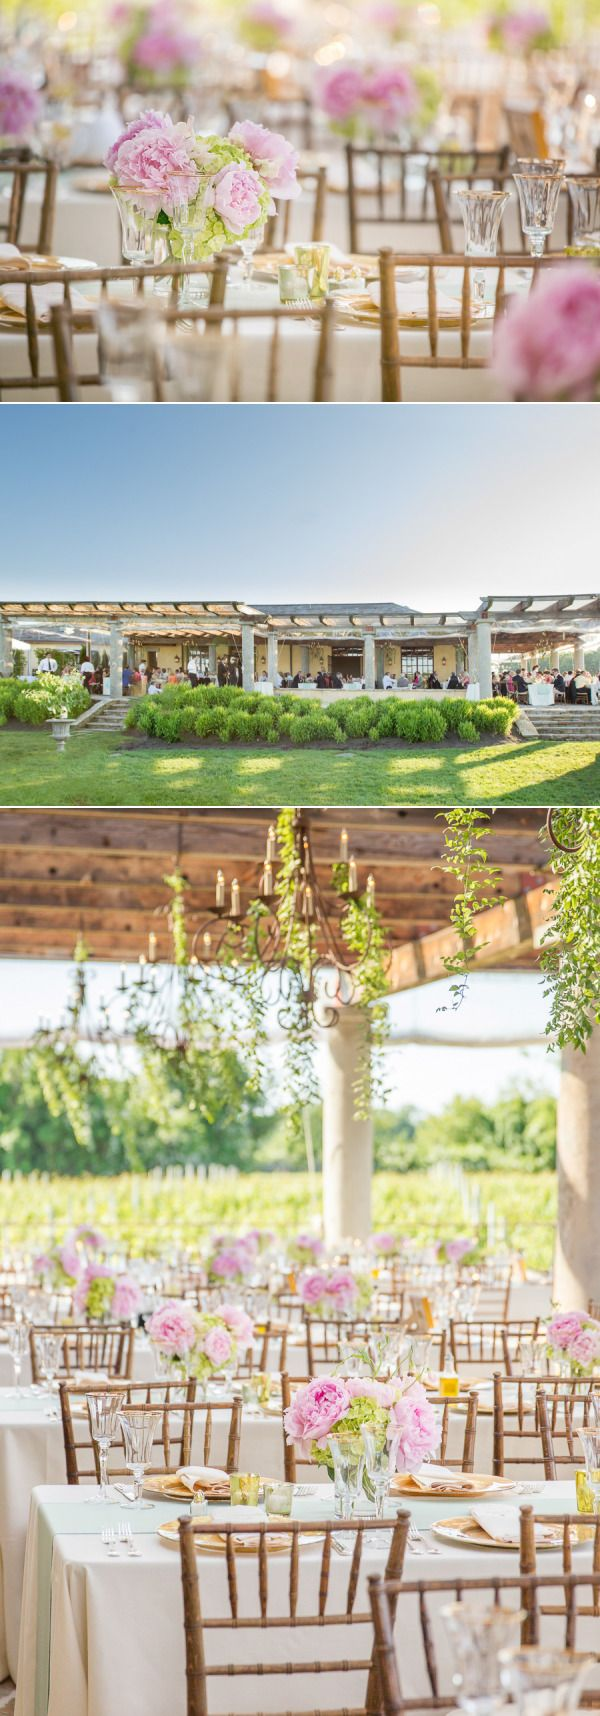 Wolffer Estate, Vineyard Wedding, Hamptons, New York from Melani Lust Photography - Style Me Pretty